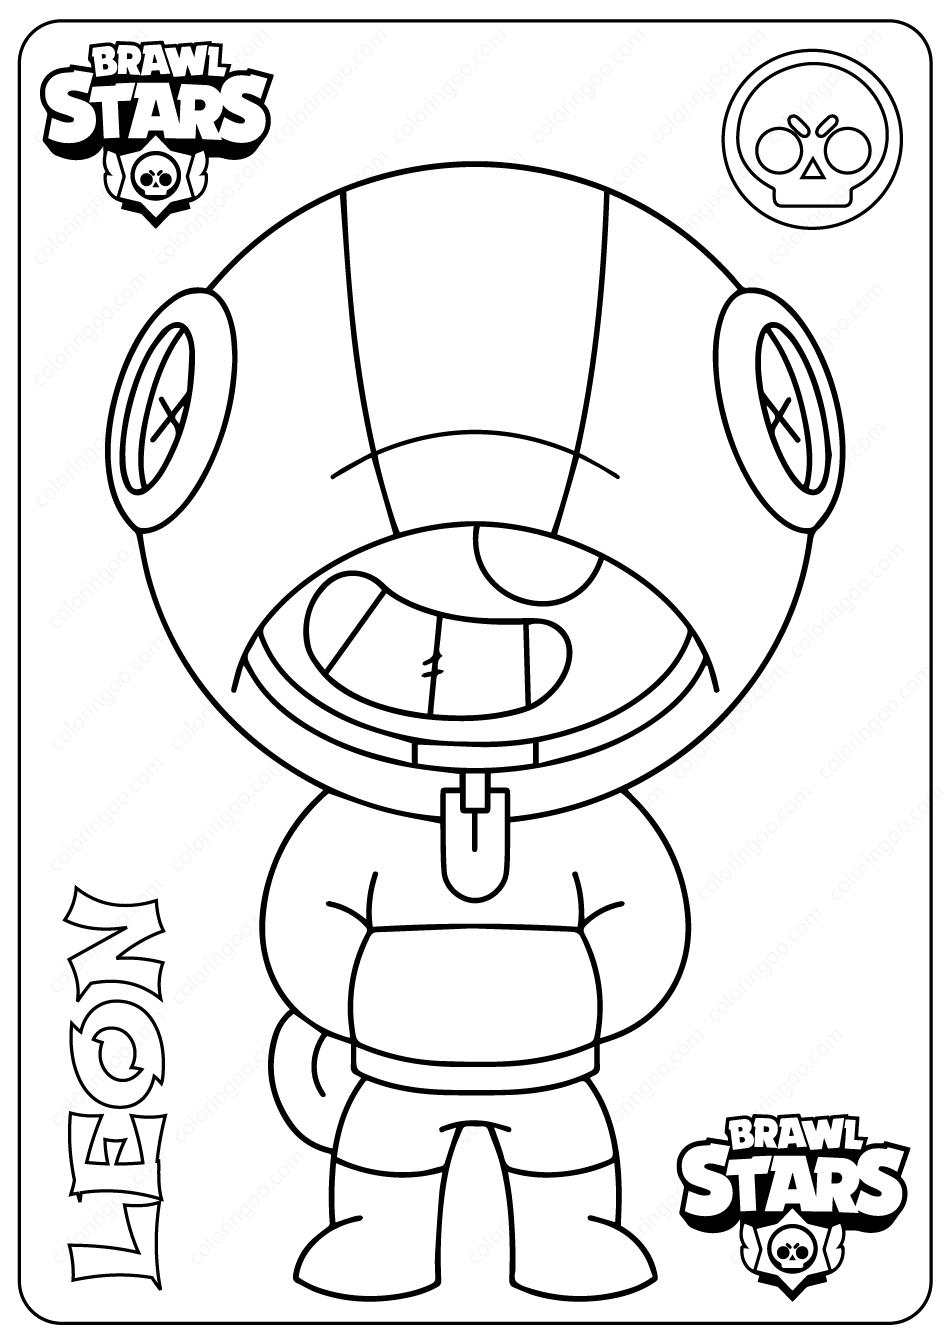 Printable Brawl Stars (Leon) PDF Coloring Pages